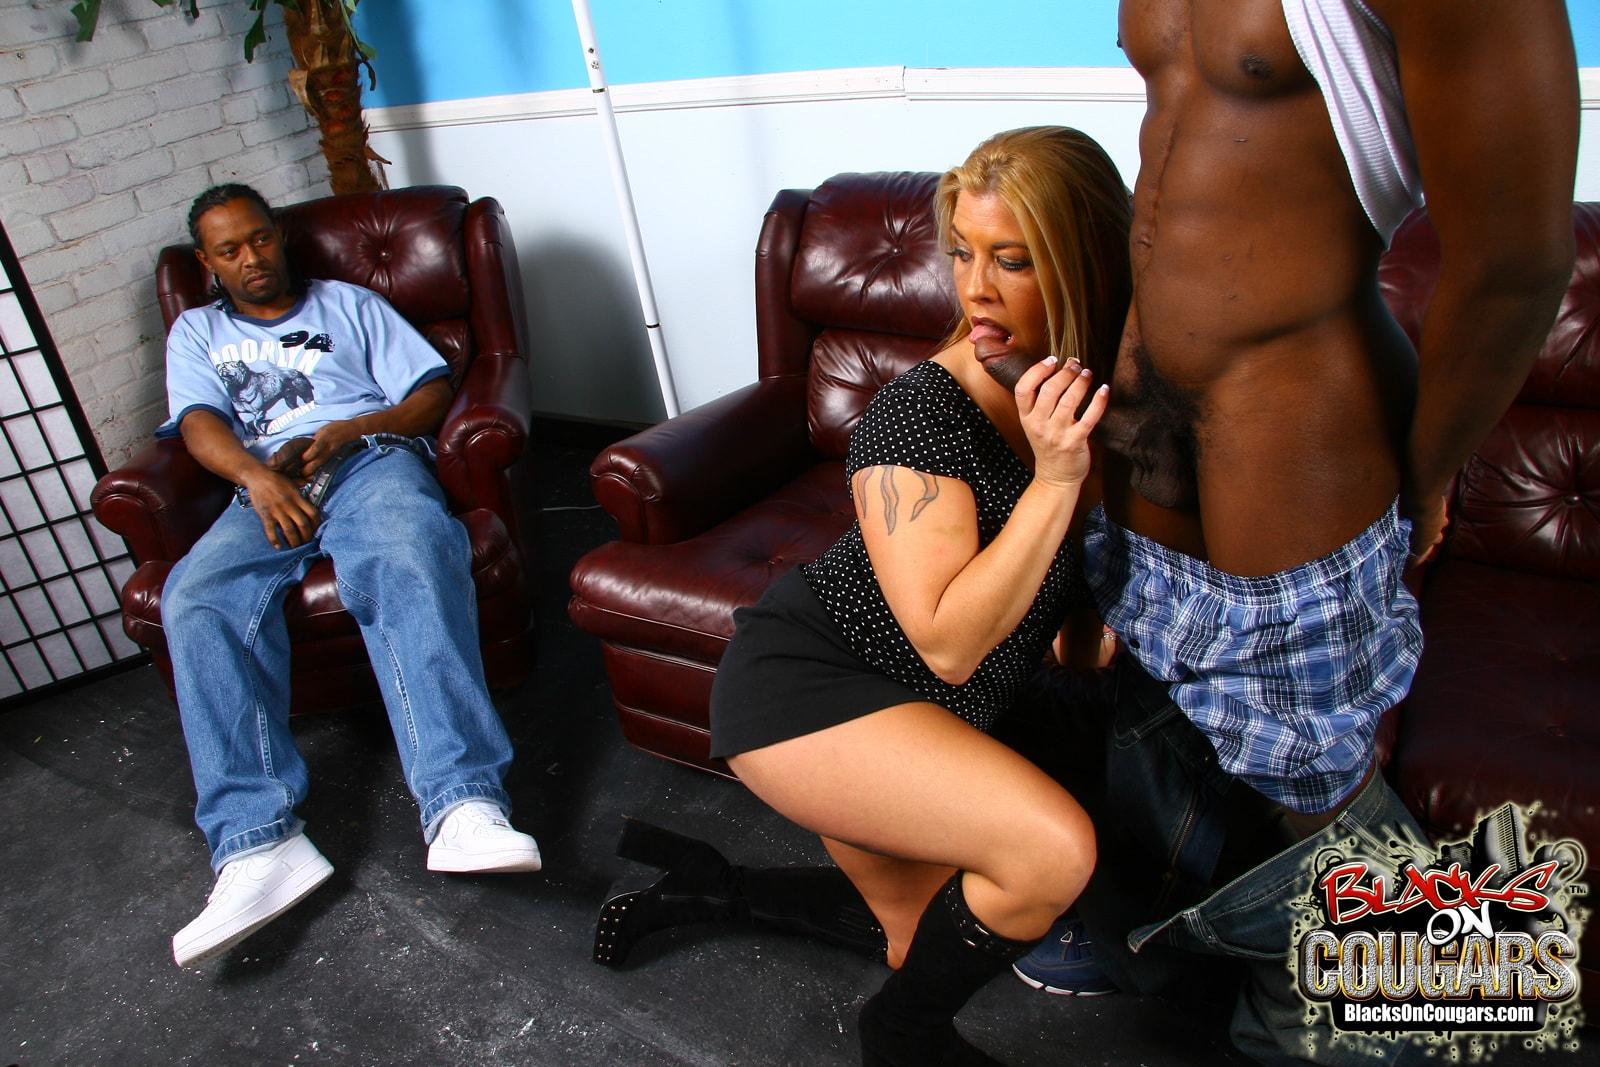 Dogfart '- Blacks On Cougars' starring Joclyn Stone (Photo 11)